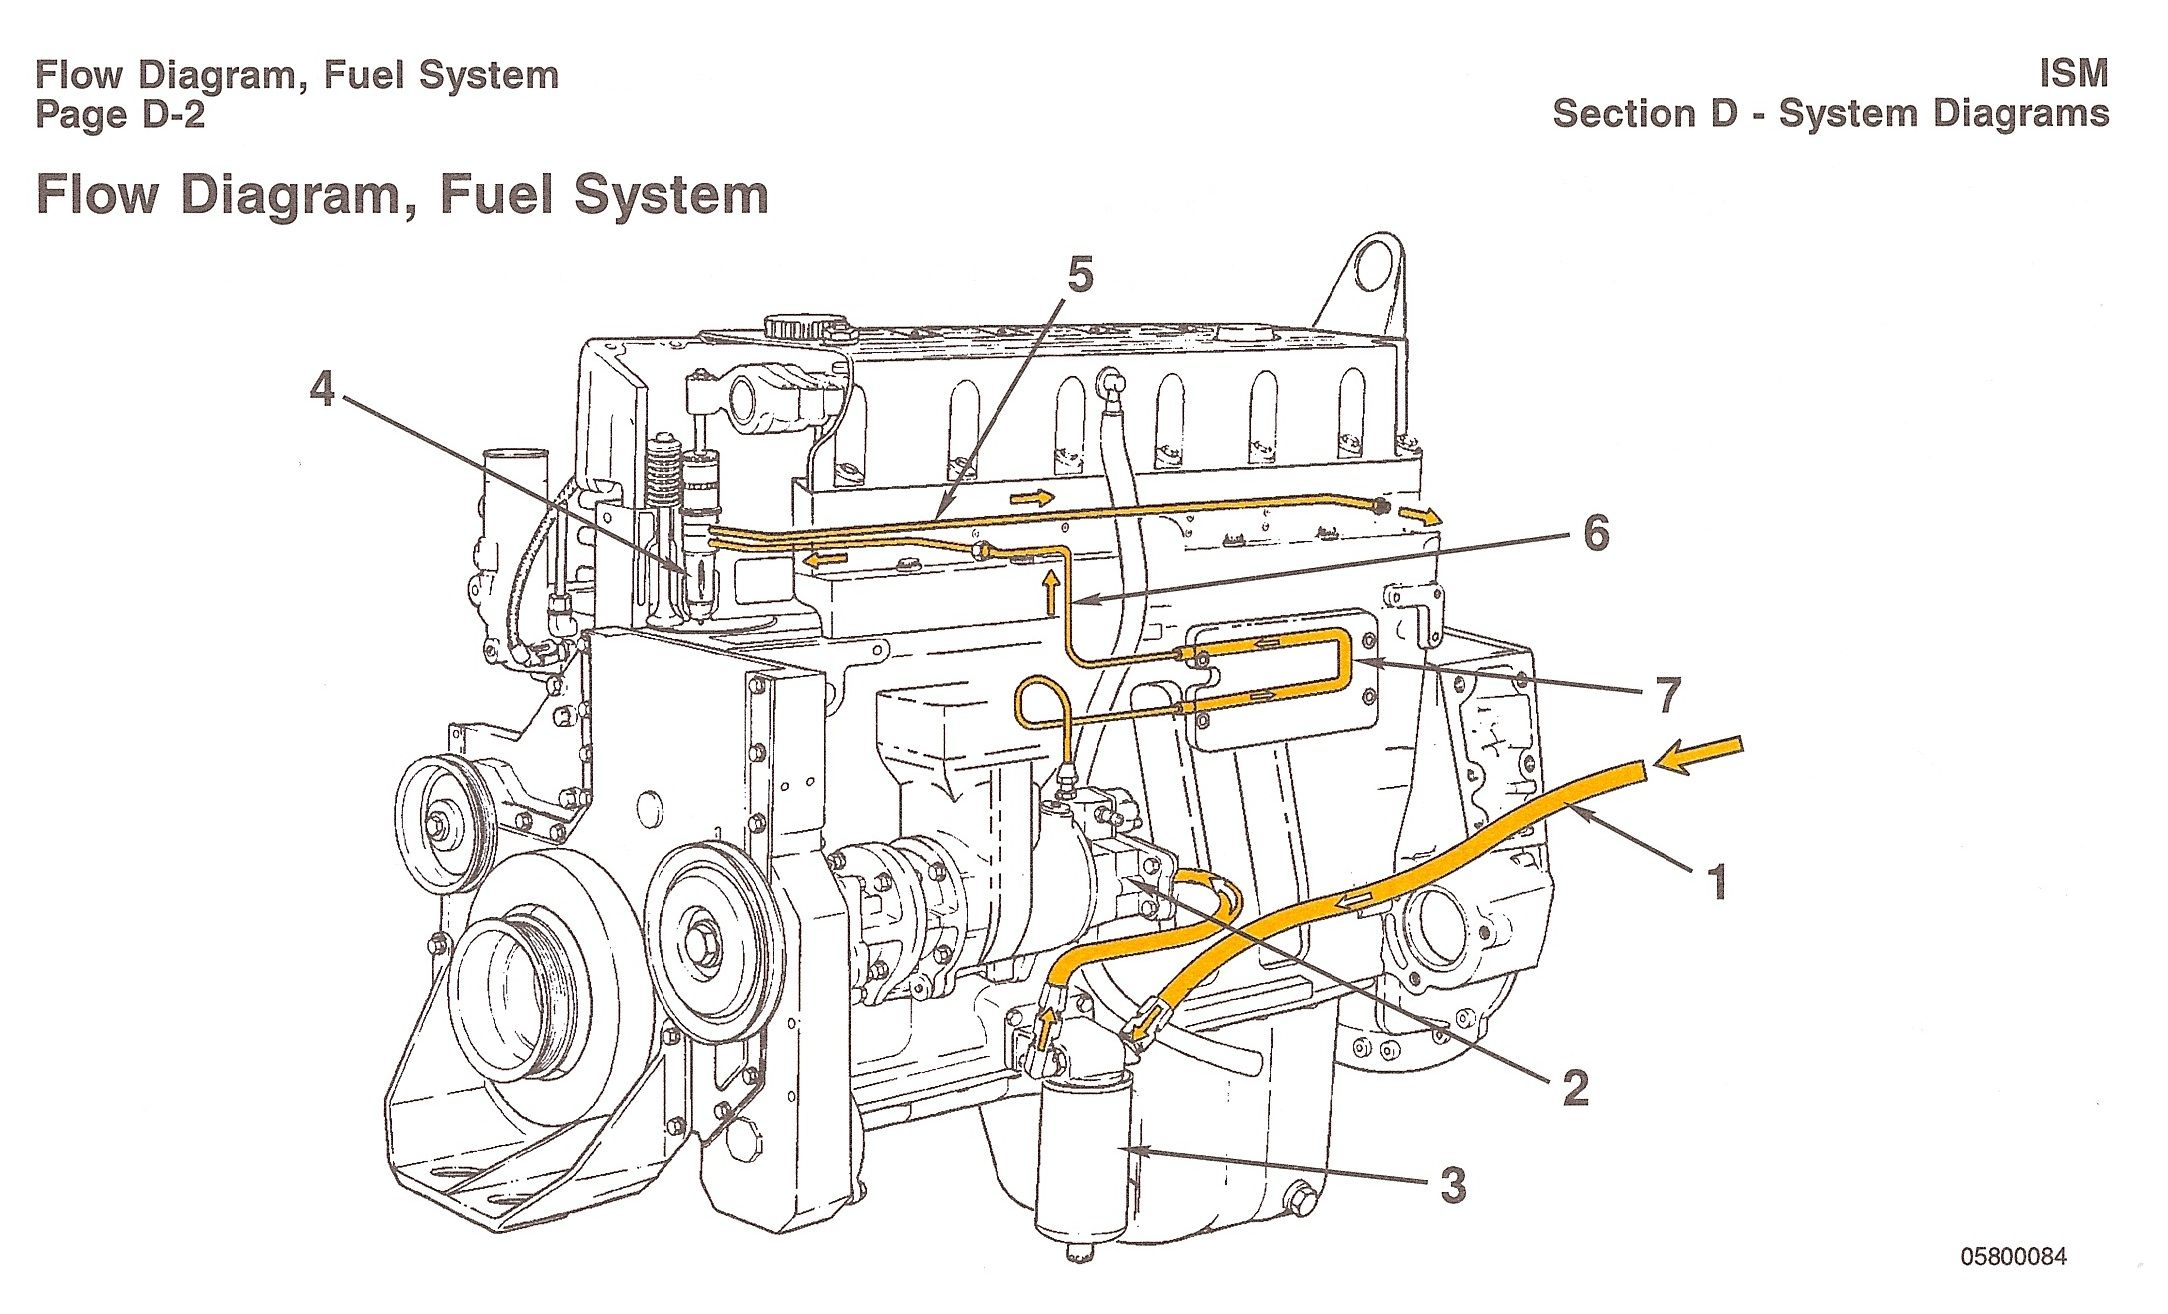 Diesel Engine Wiring Diagram Kia Sorento D4cb Diagrams